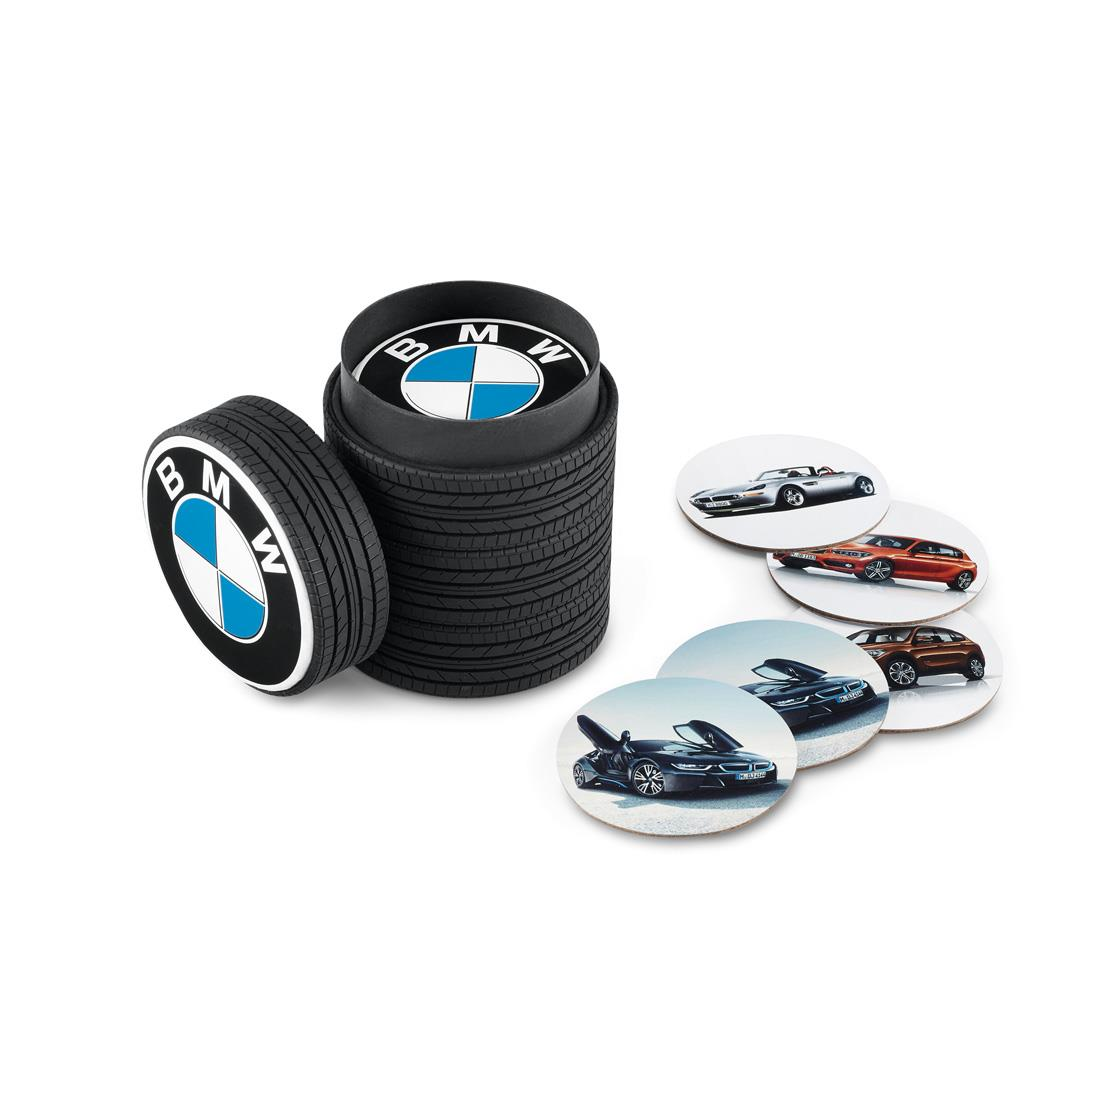 BMW Memory Game